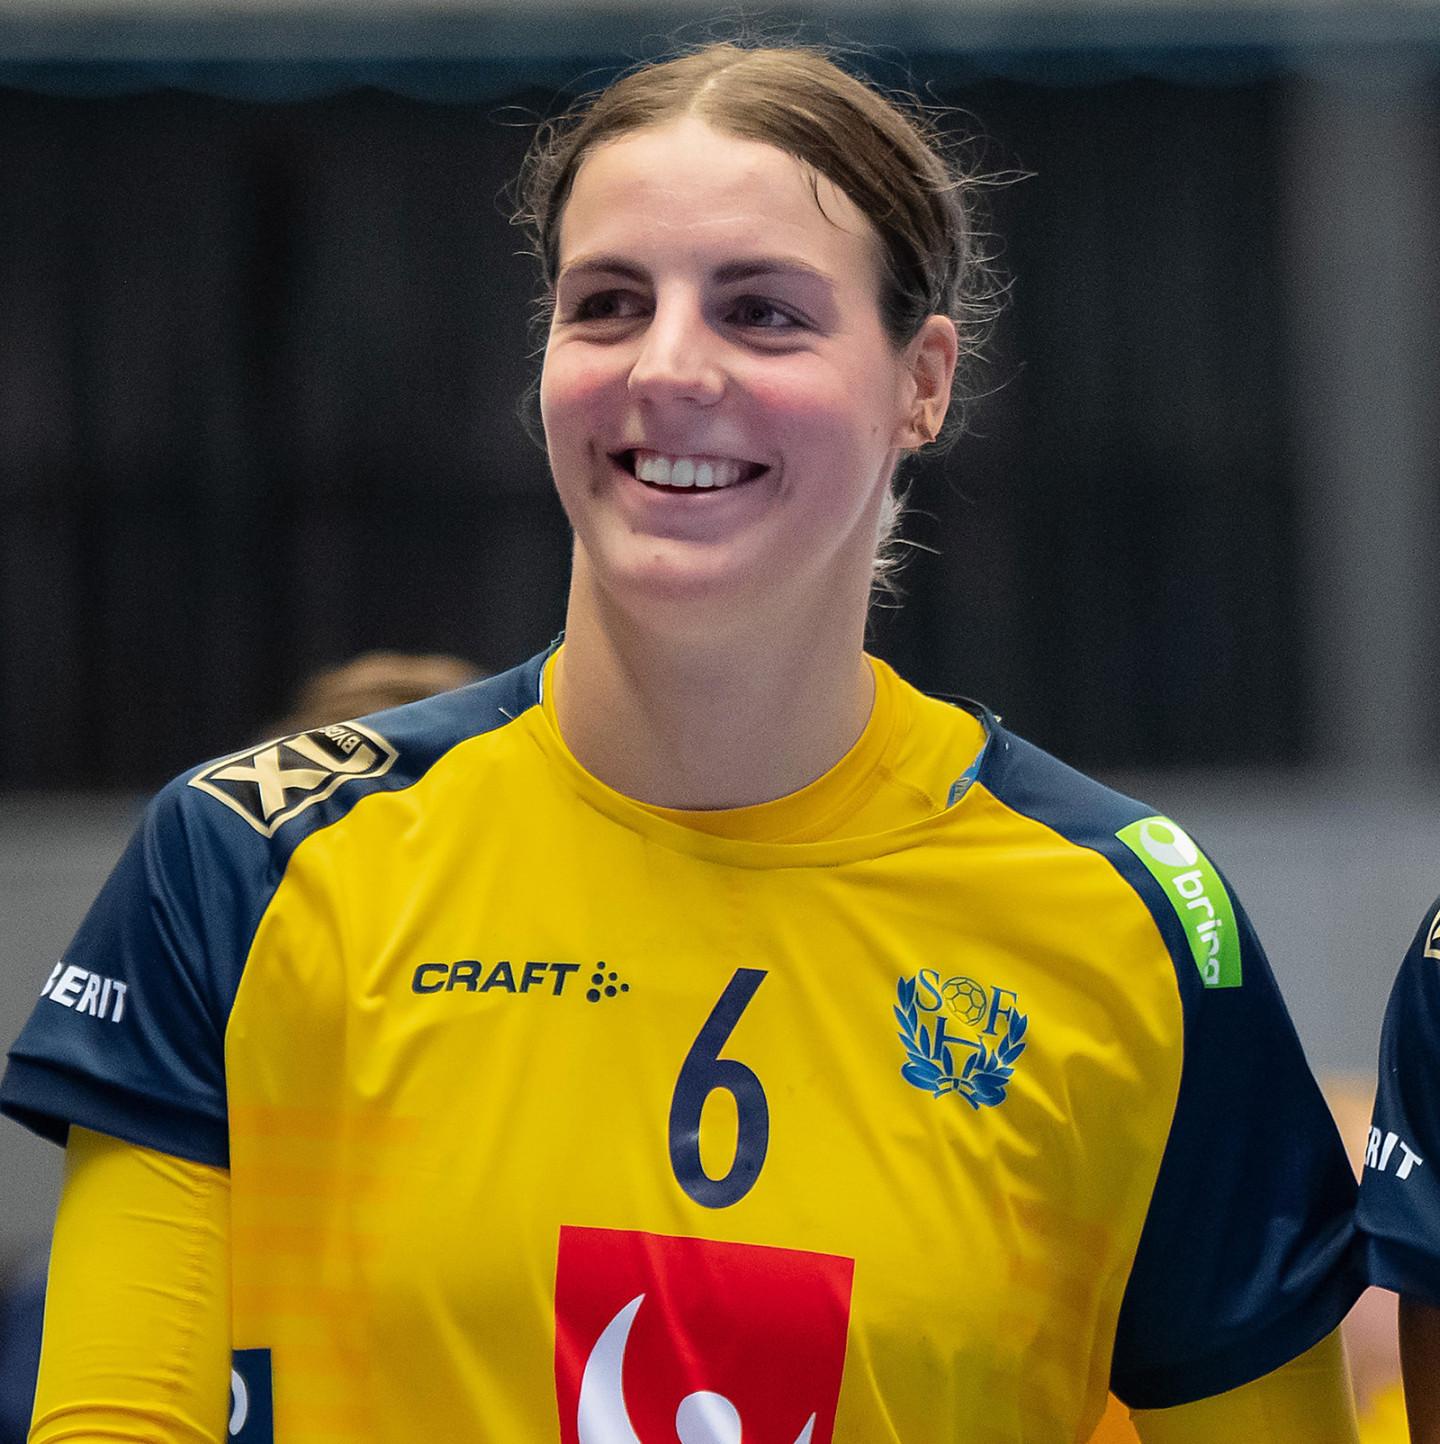 6 Carin Strömberg